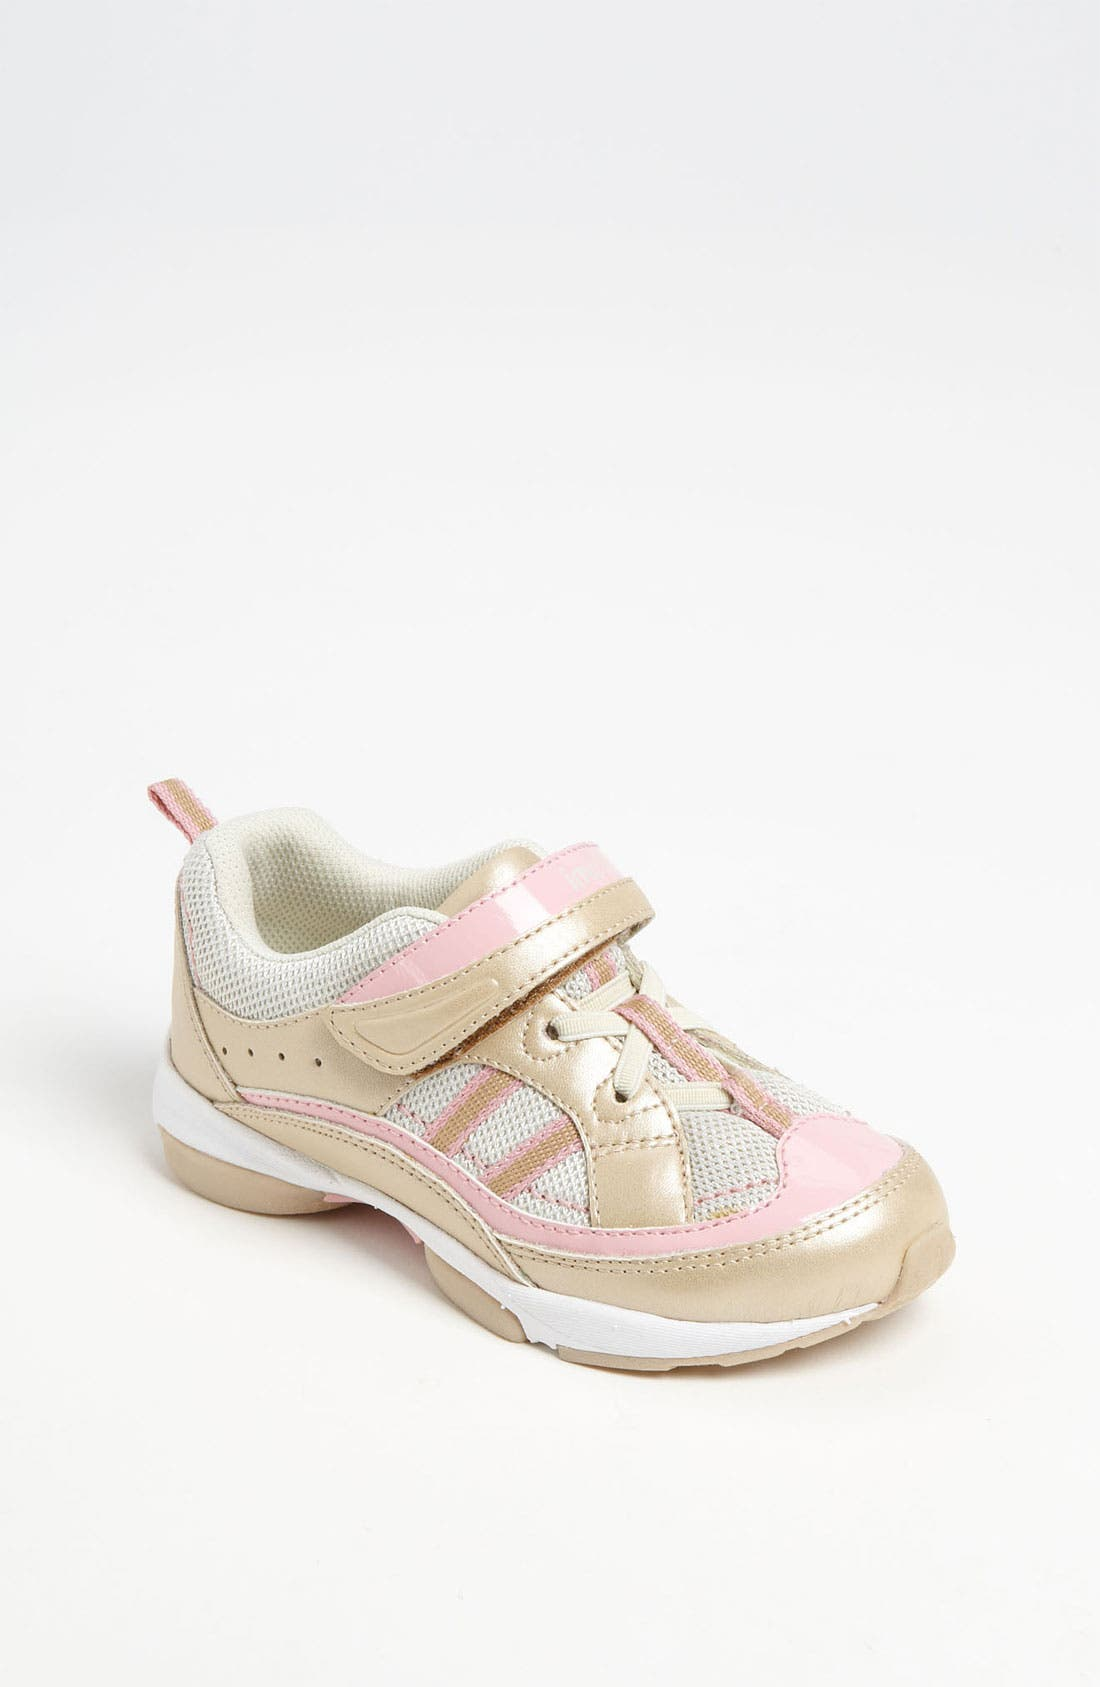 Alternate Image 1 Selected - Umi 'Connor' Sneaker (Toddler, Little Kid & Big Kid)